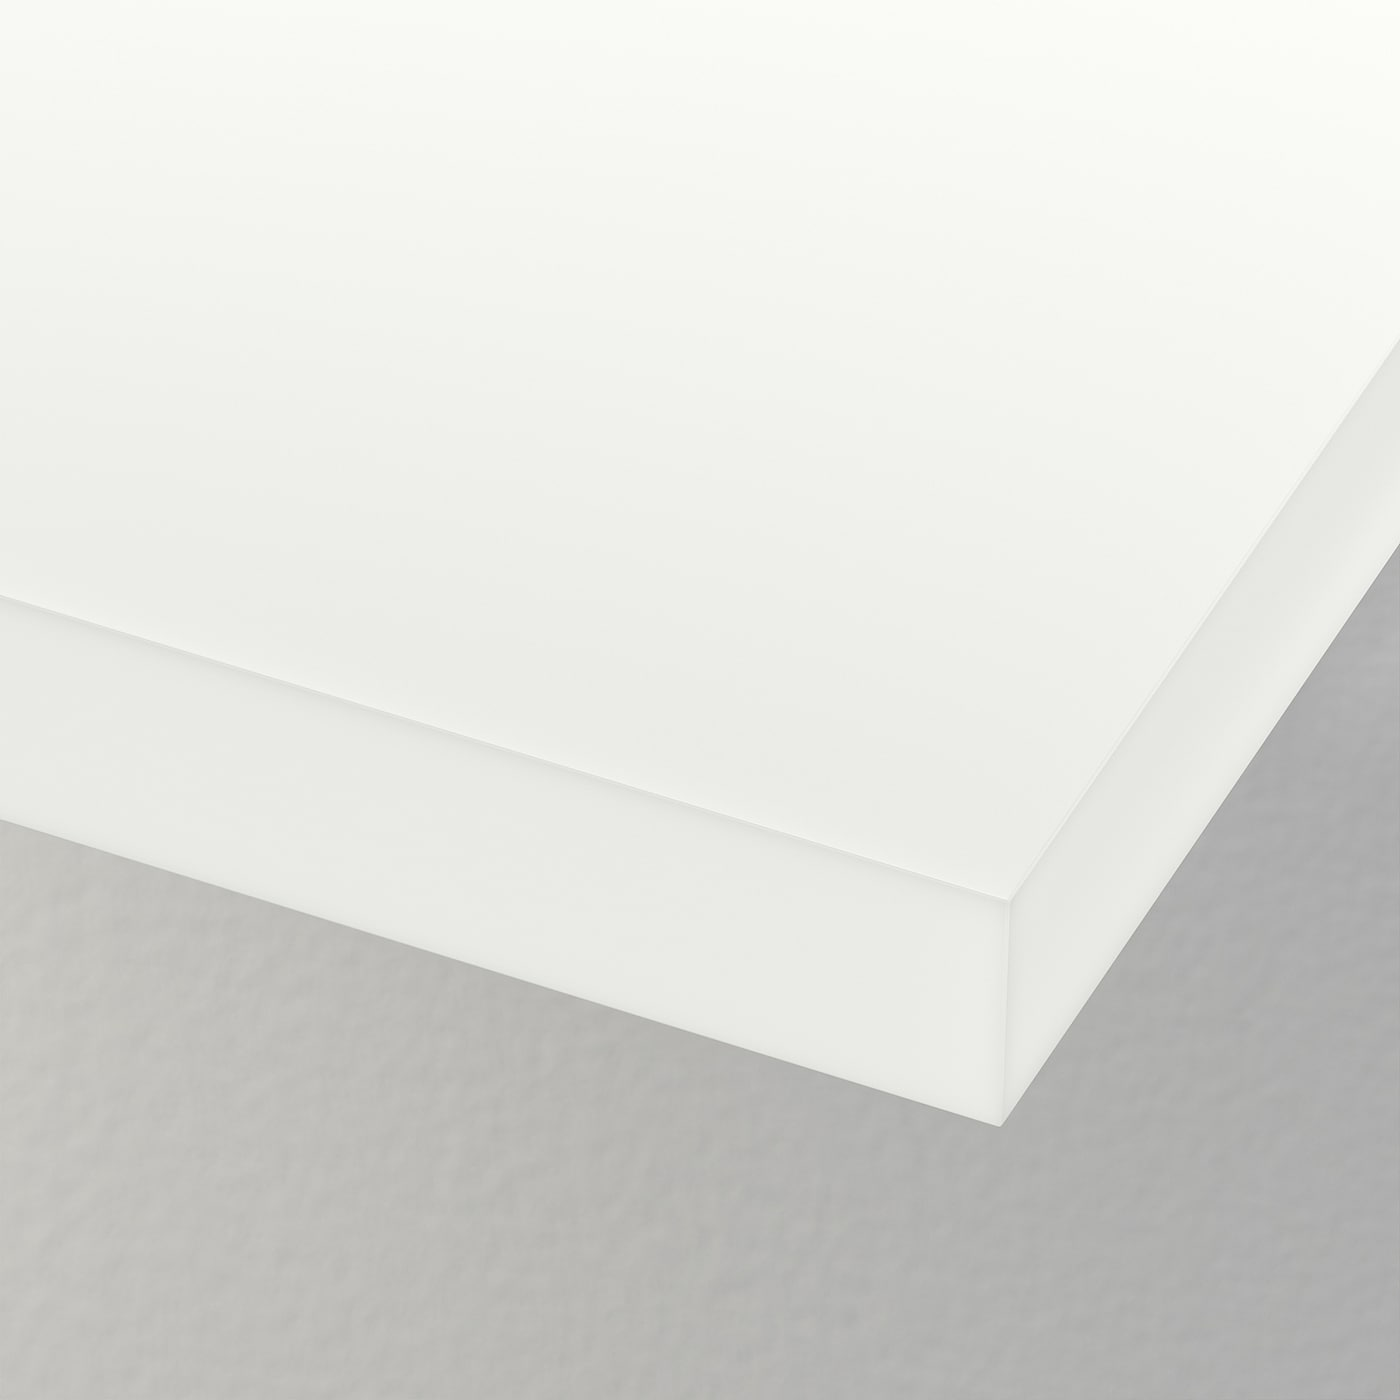 Lack Wall Shelf White 74 3 4x10 1 4 Ikea